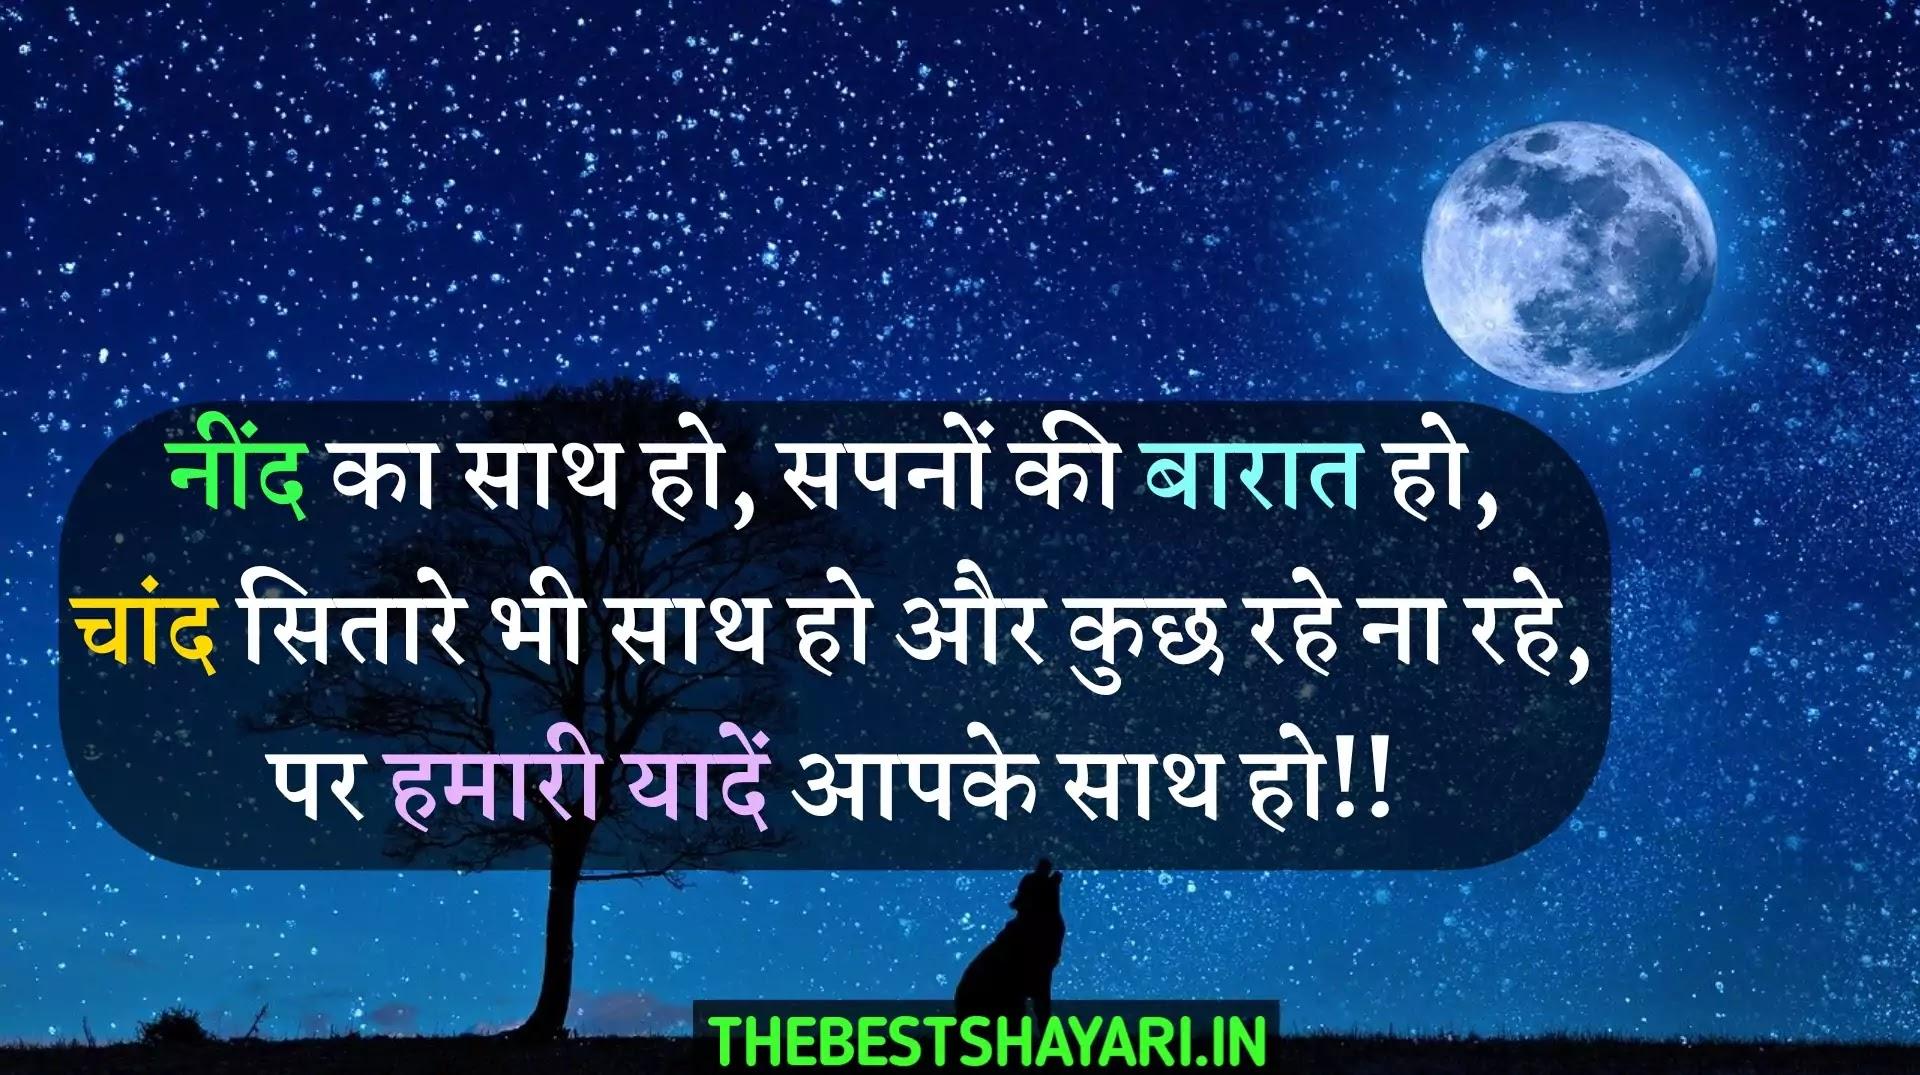 Loving good night message